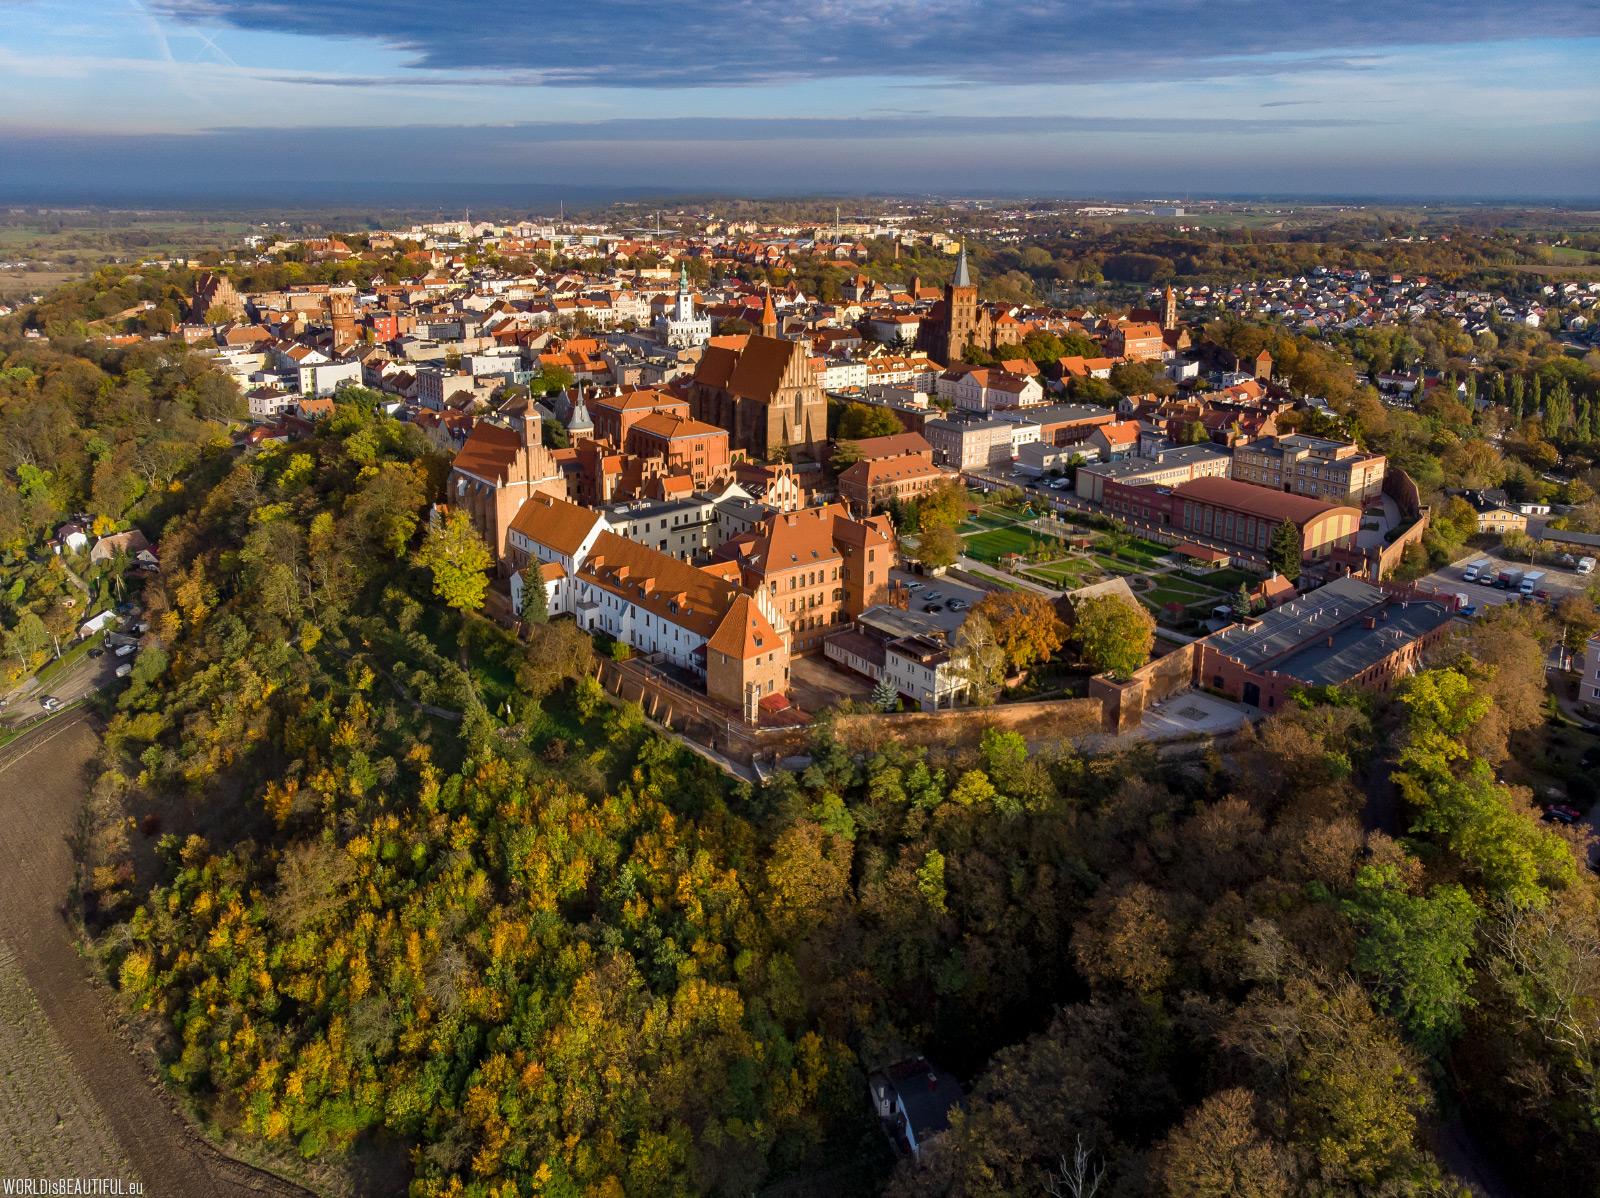 Photos from Chełmno in Poland